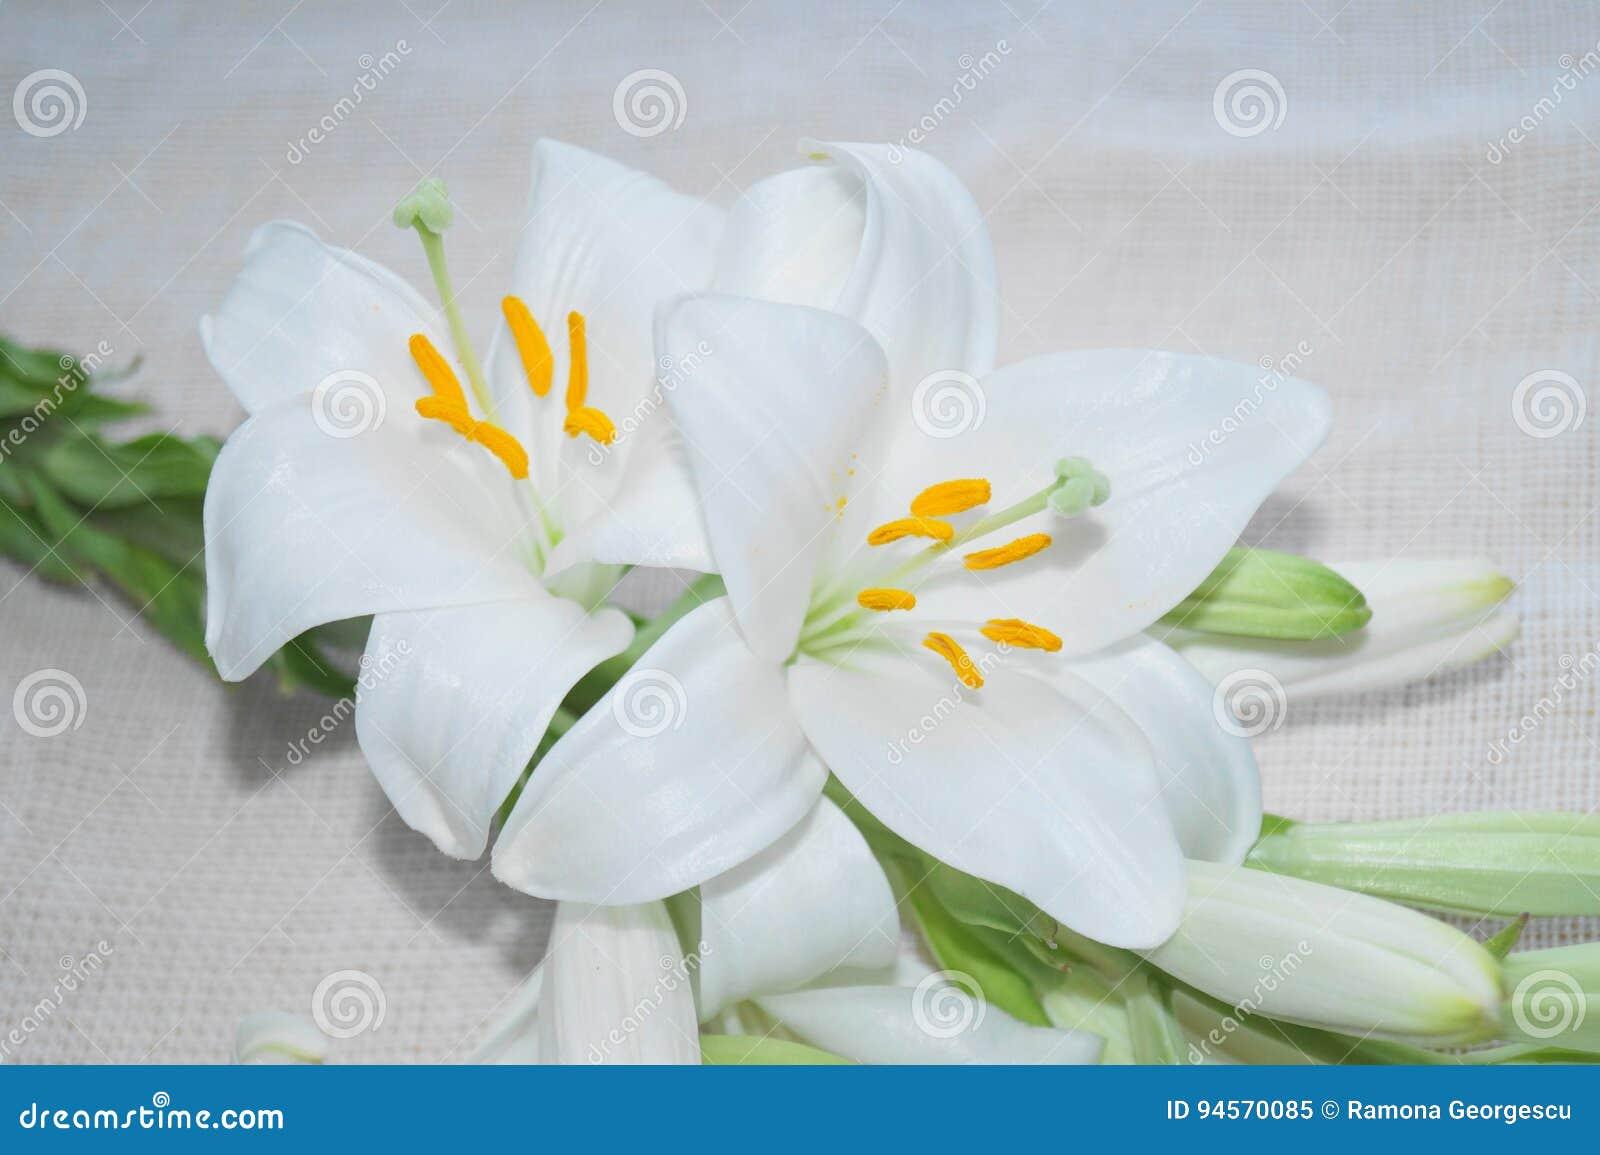 White madonna lily flower stock image image of elegant 94570085 download comp izmirmasajfo